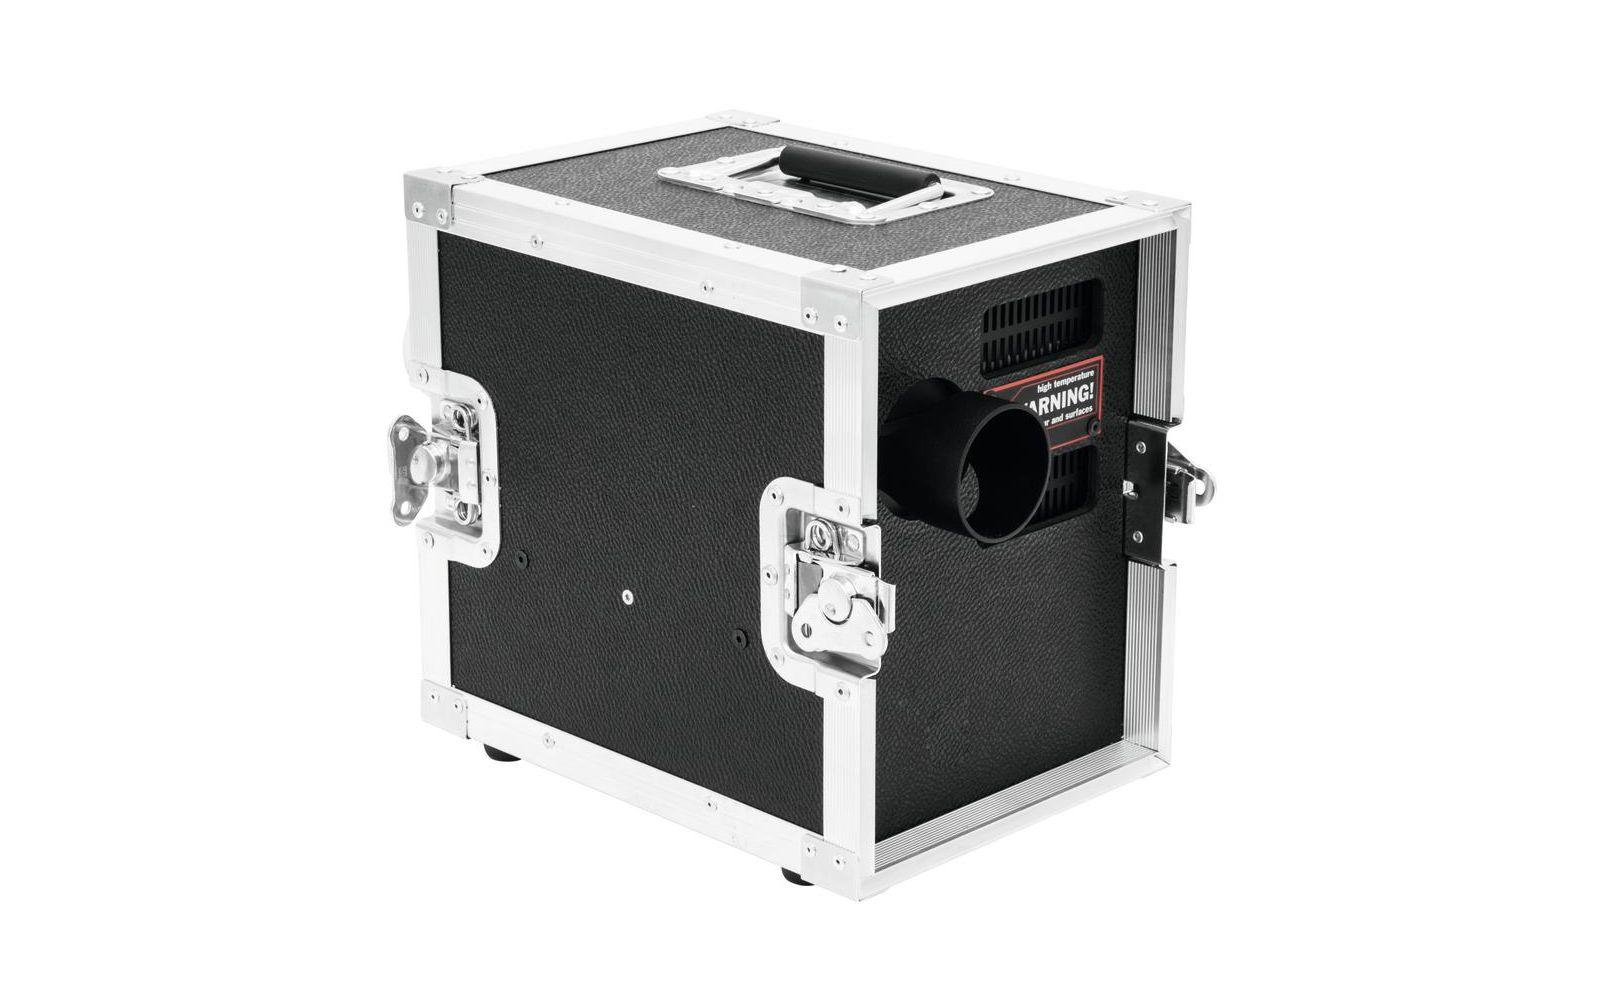 hazebase-base-cap-cased-nebelmaschine